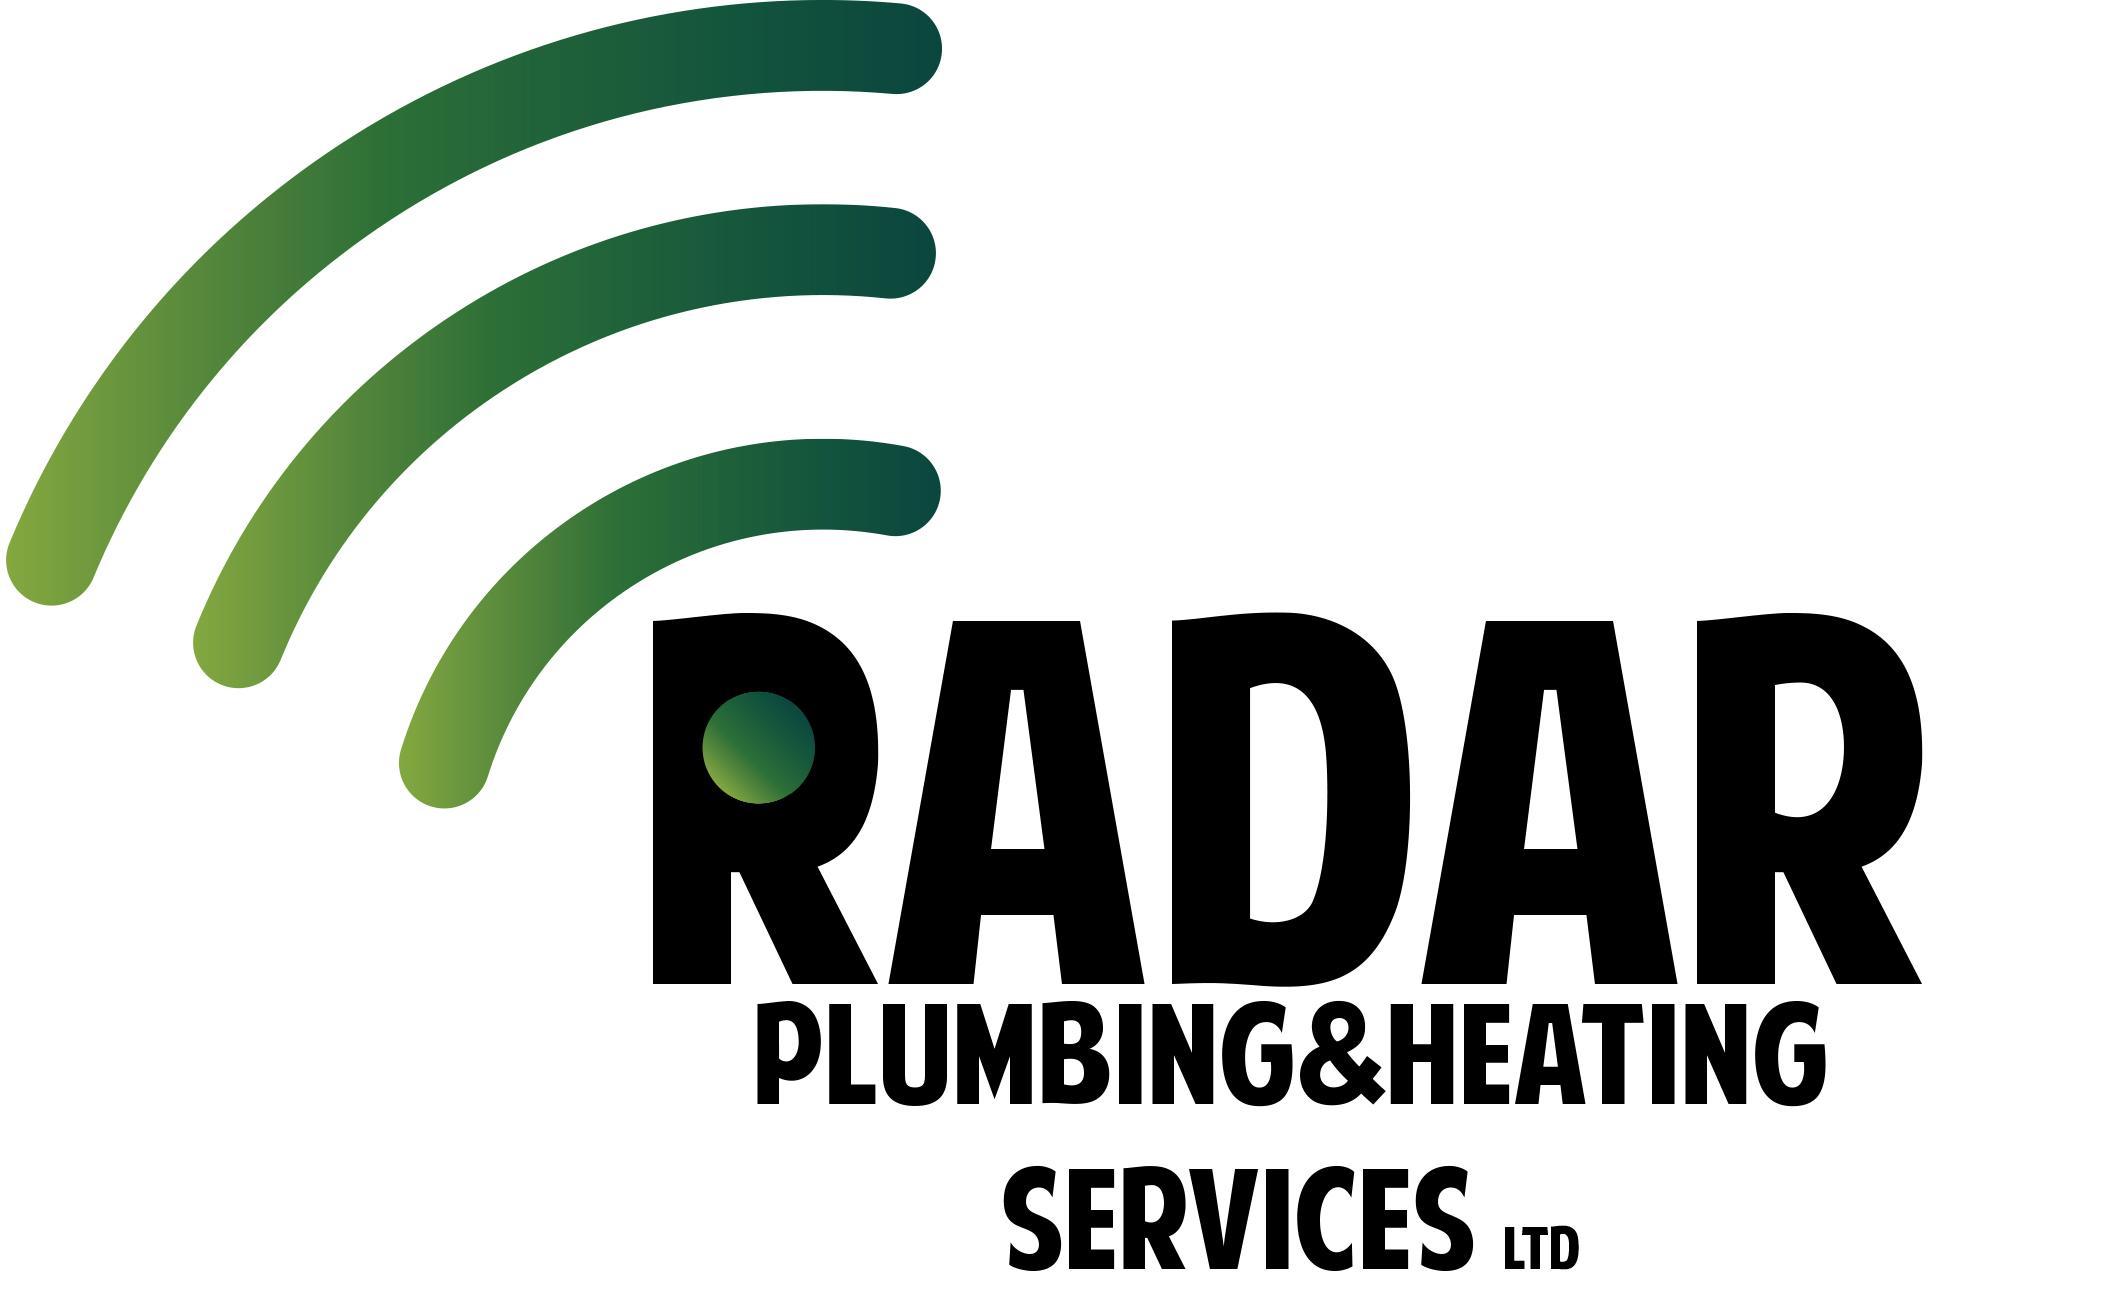 Logo Design by Private User - Entry No. 12 in the Logo Design Contest Inspiring Logo Design for Radar Plumbing & Heating Services Ltd..